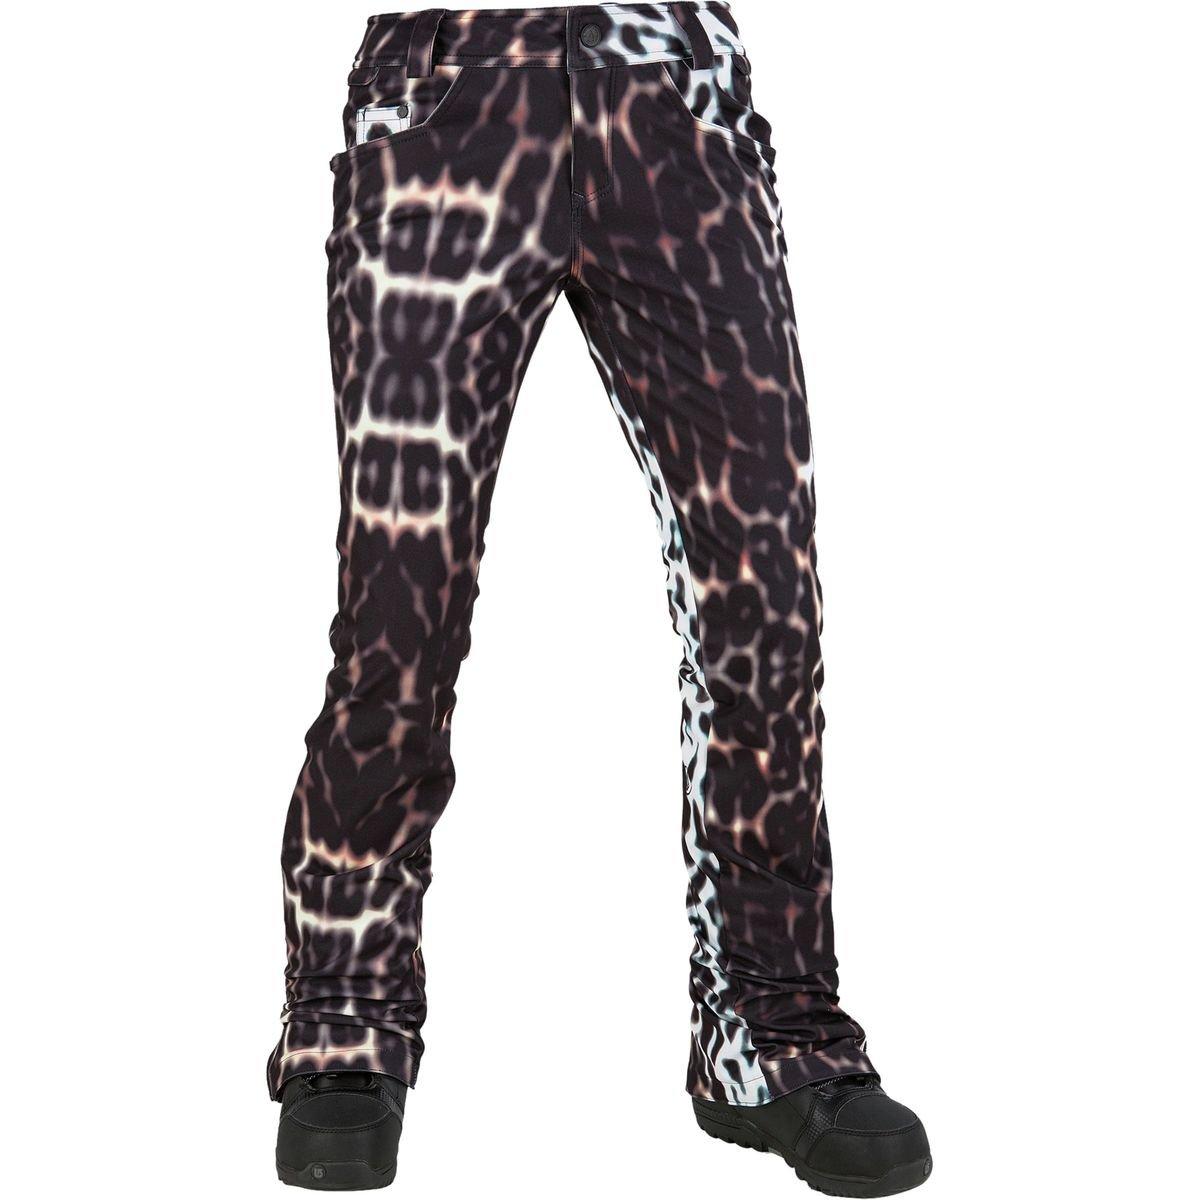 Volcom Snow Women's Battle Stretch Pants Cheetah Small